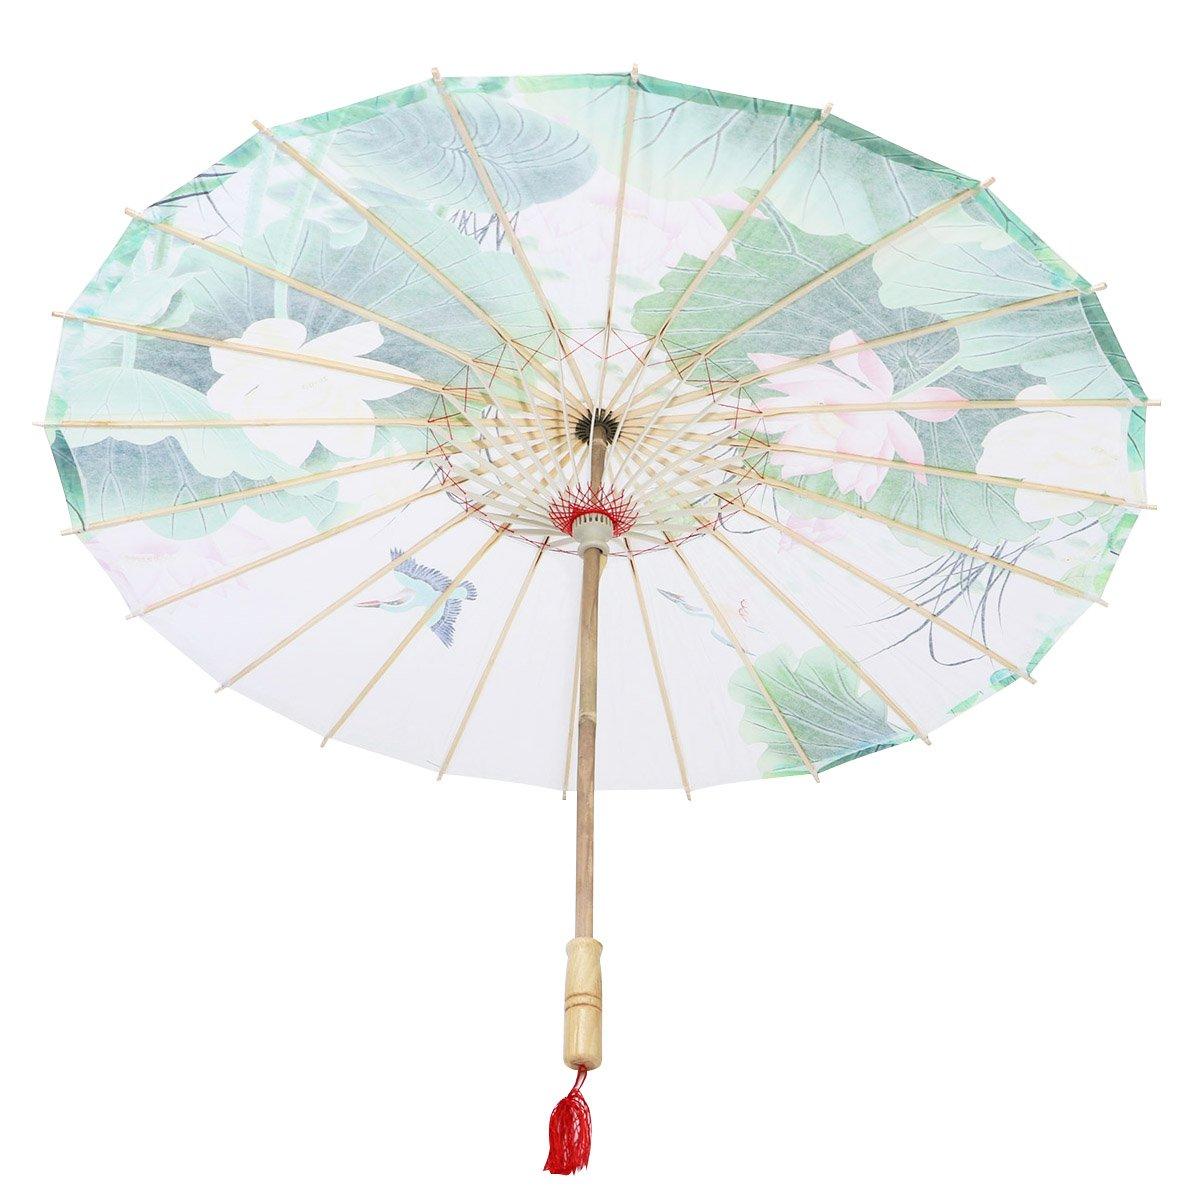 Healifty Oil Paper Umbrella Custom Water Town Classical COS Umbrella not Rainproof Dance Chinese Style Craft Umbrella Prop (Green)